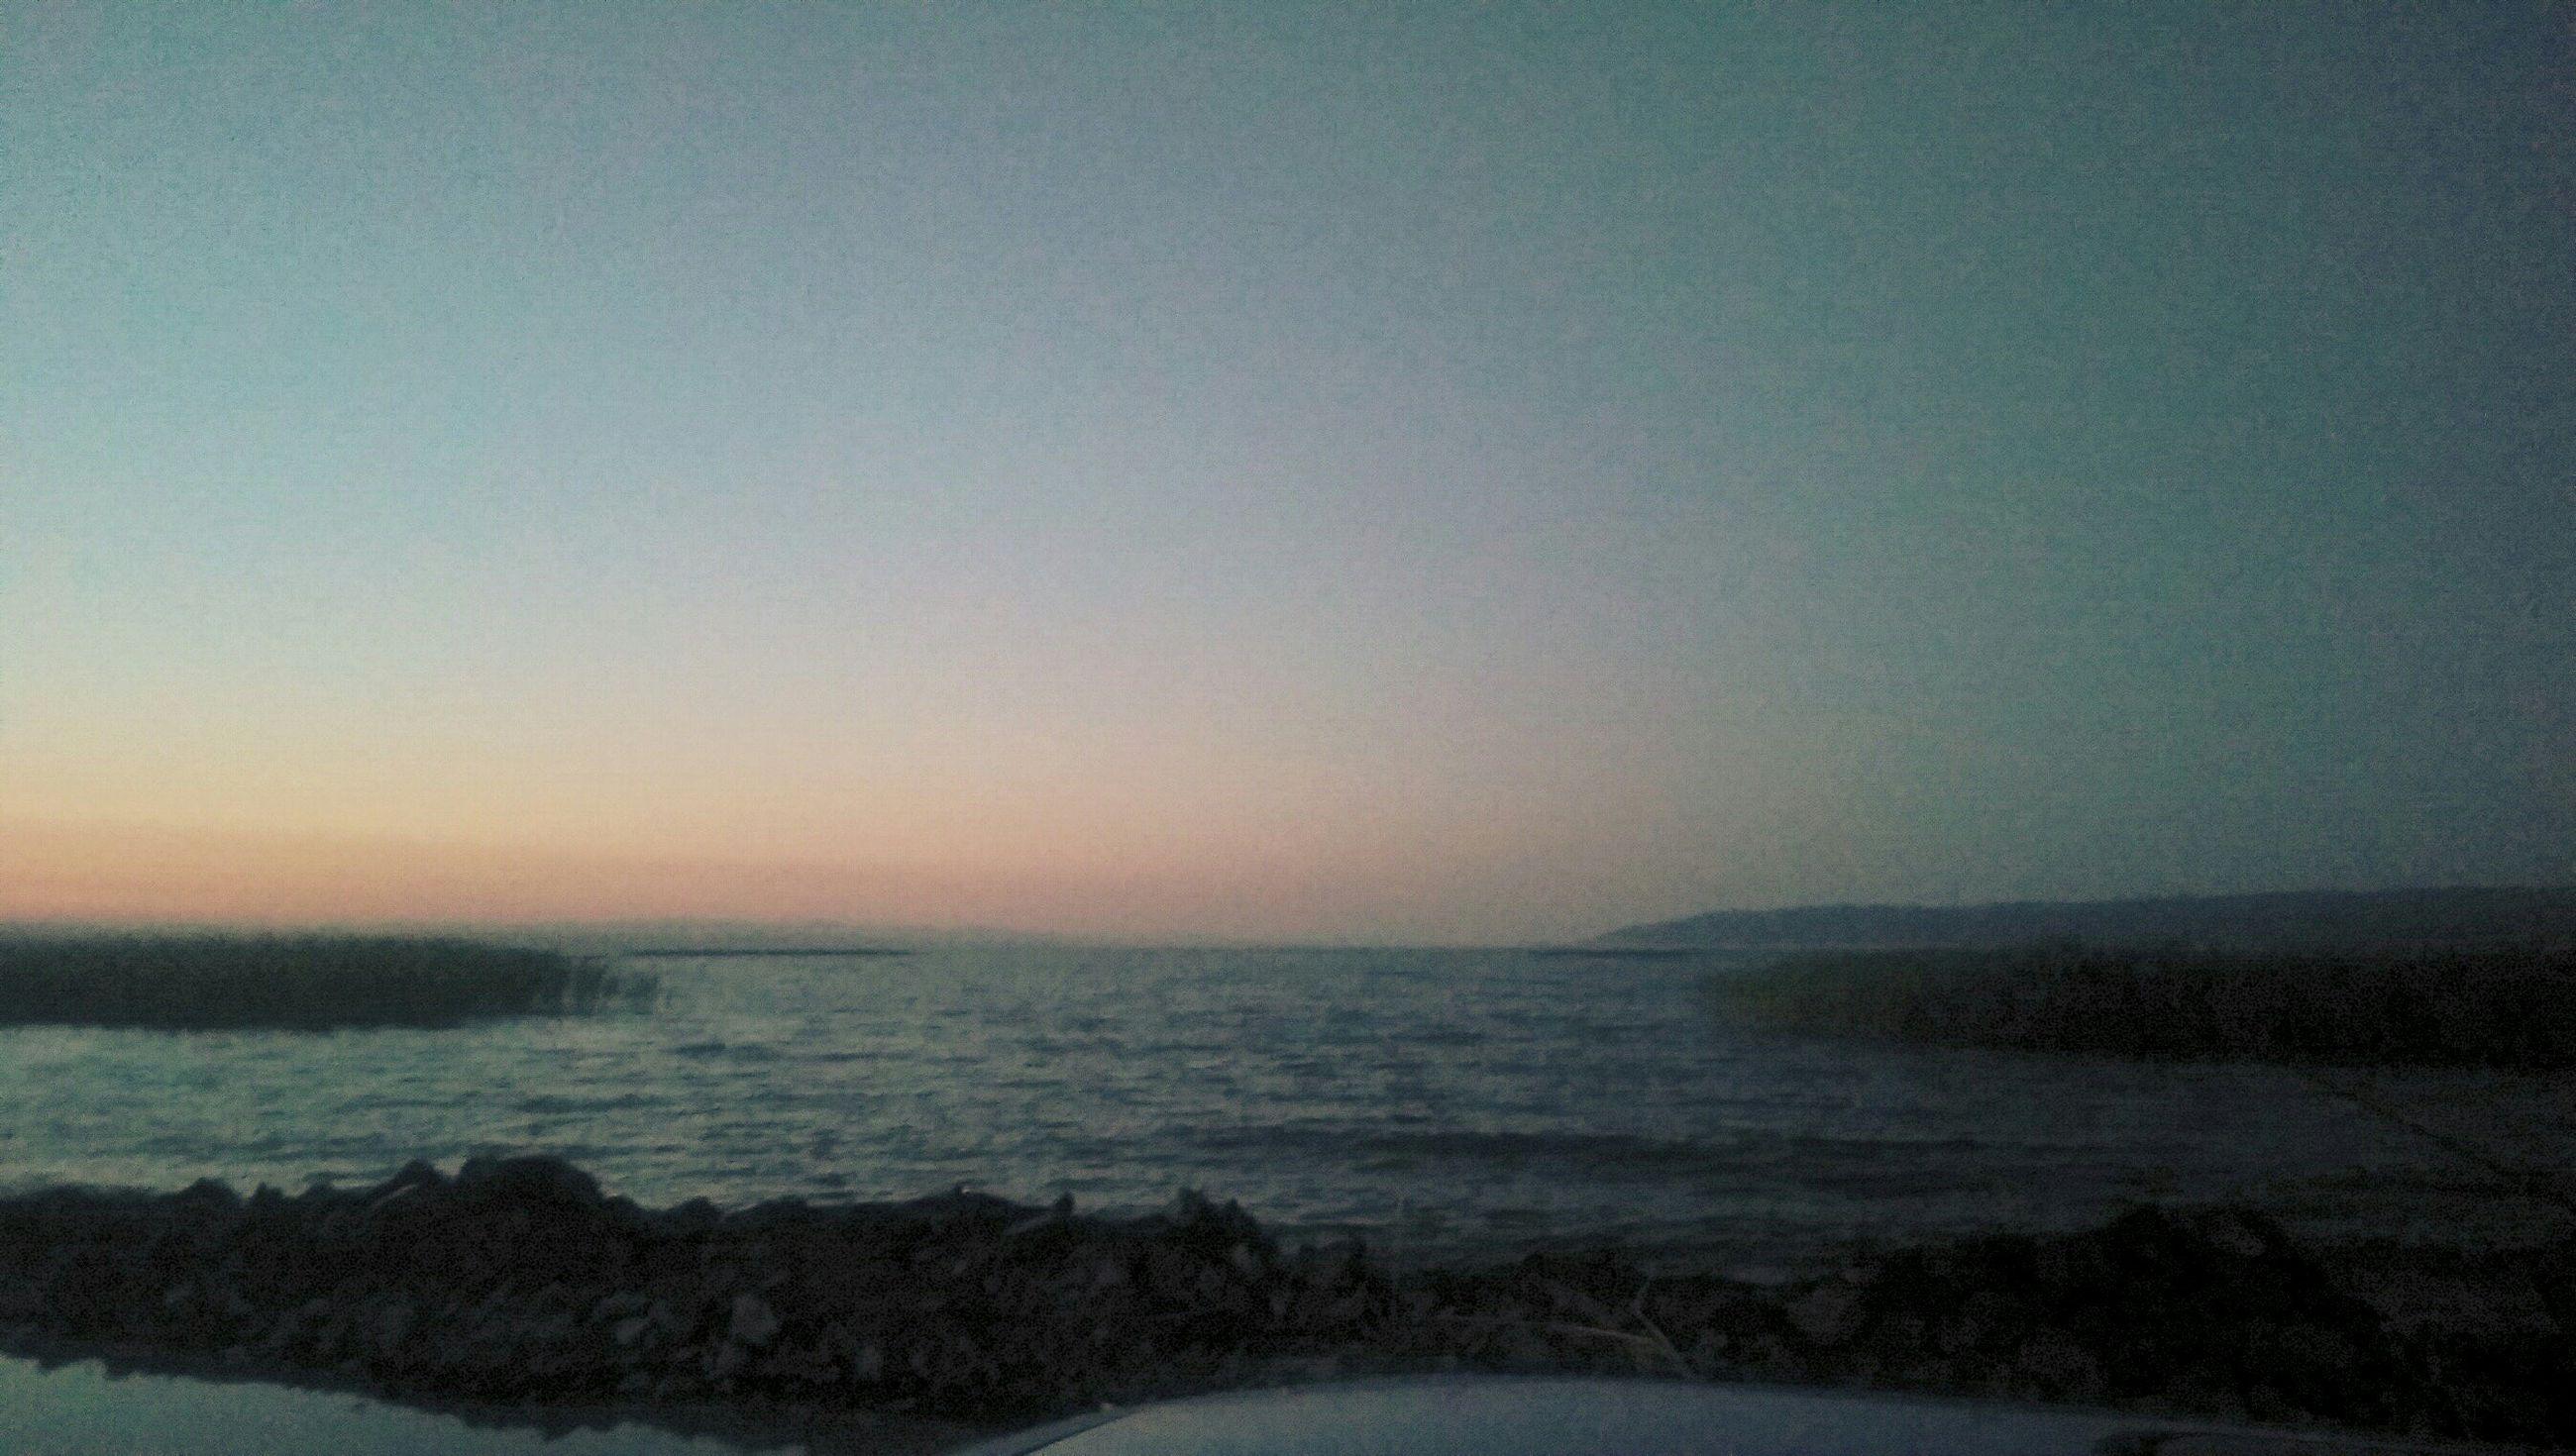 sea, water, tranquil scene, scenics, horizon over water, tranquility, copy space, beauty in nature, clear sky, beach, nature, shore, idyllic, sunset, sky, remote, non-urban scene, calm, dusk, coastline